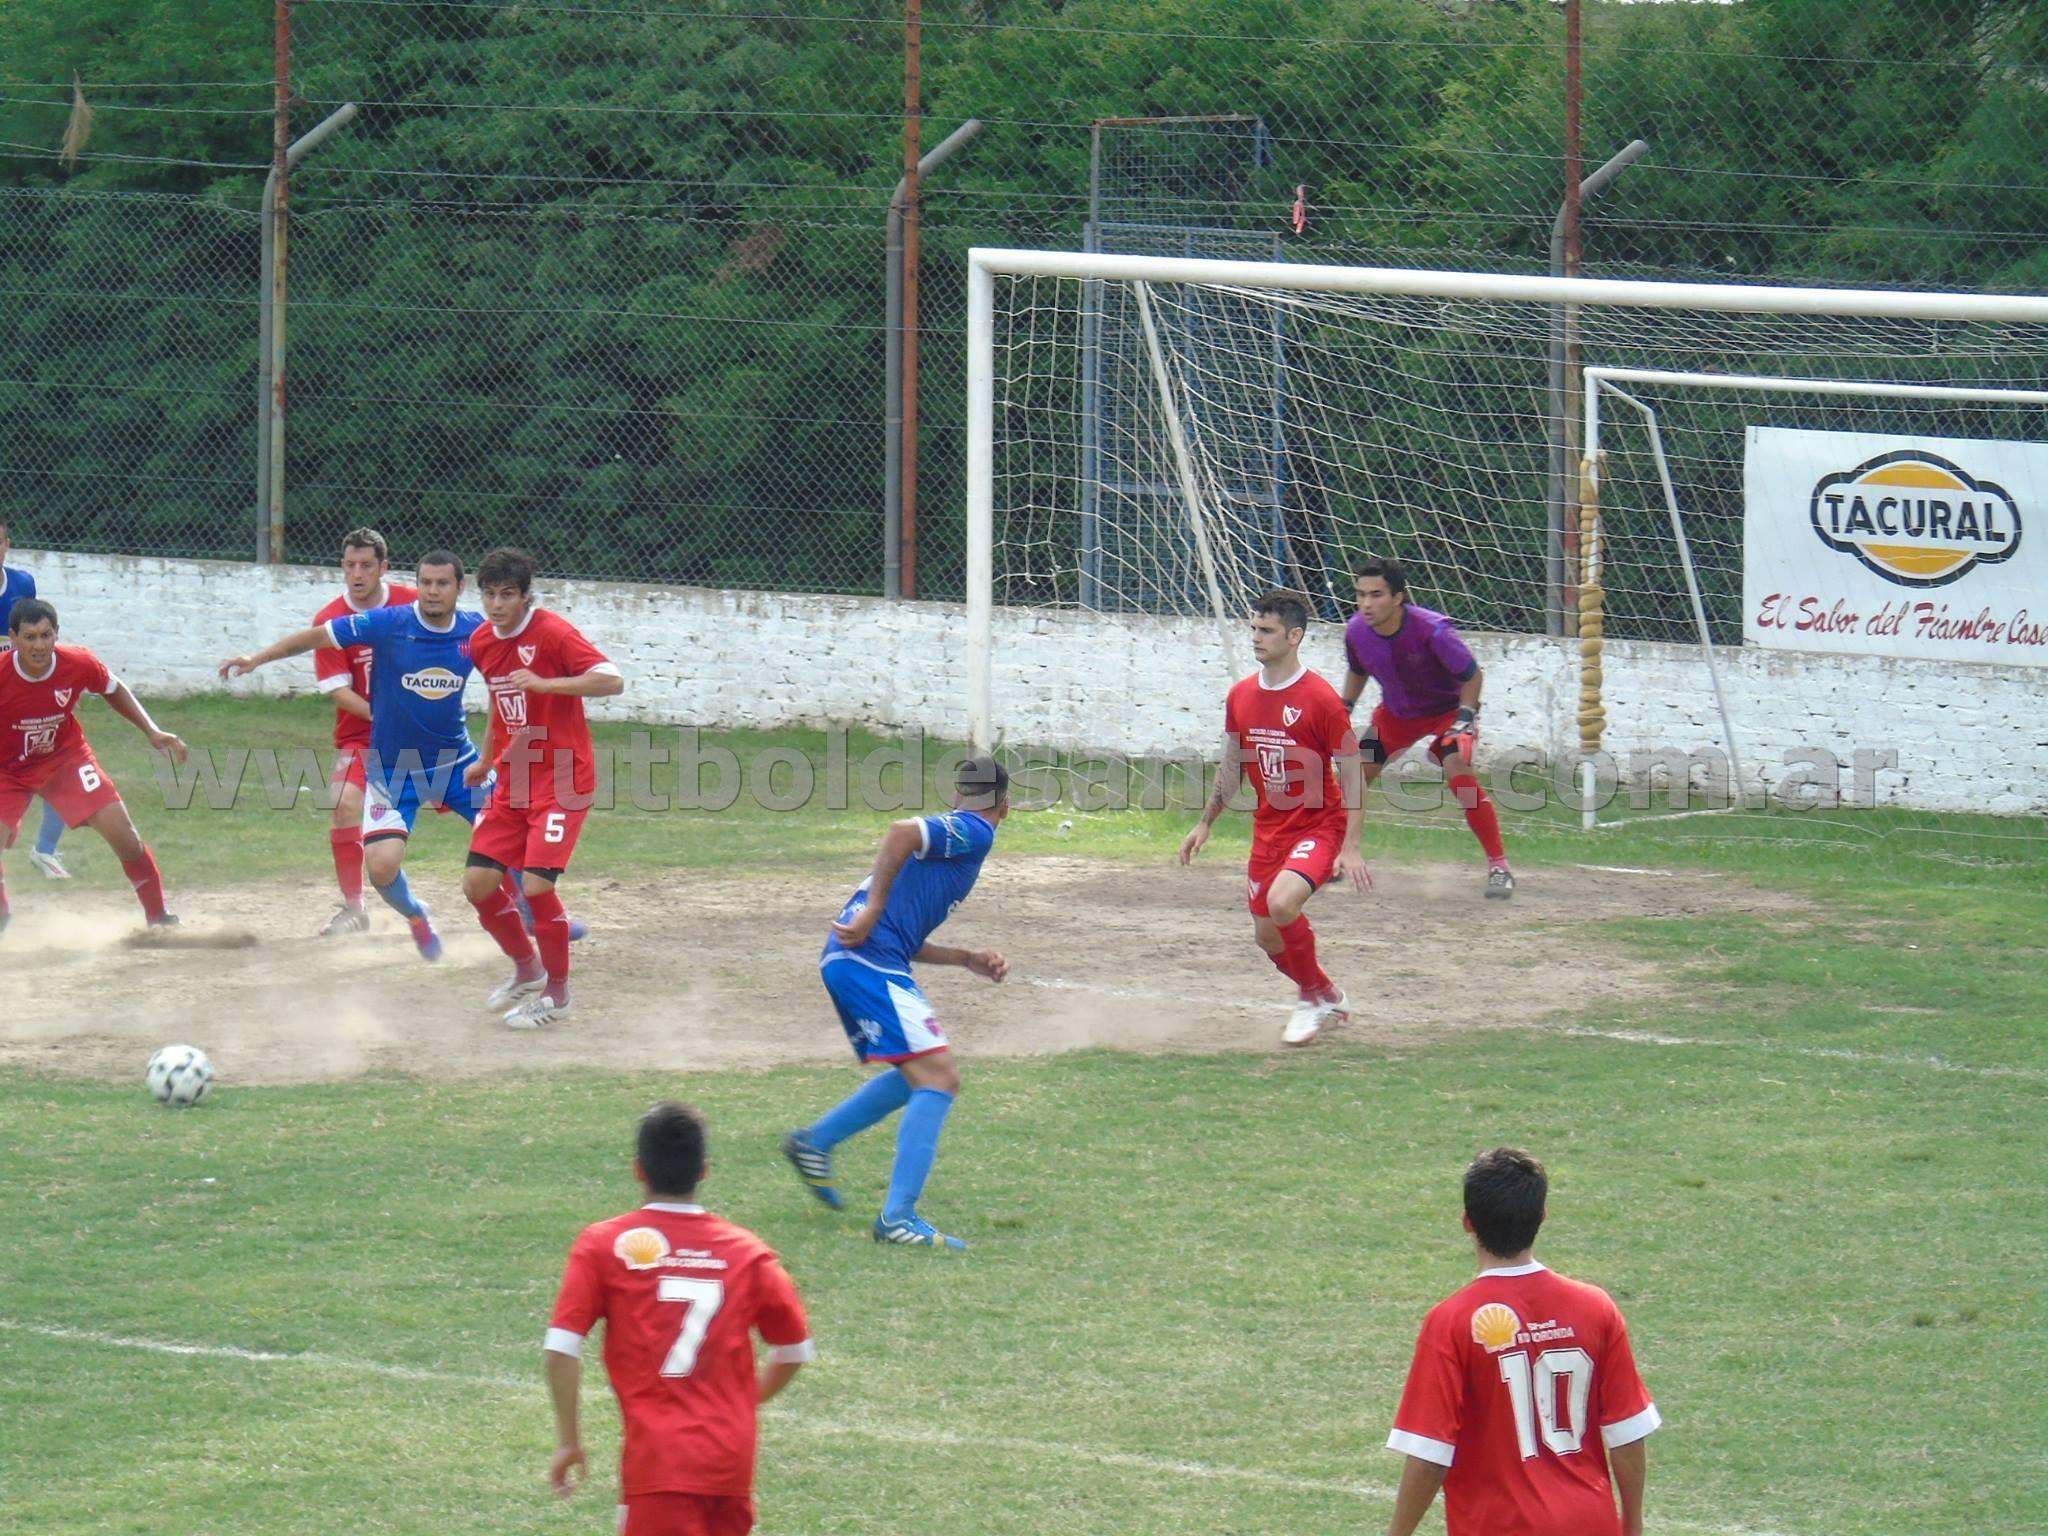 Sobre la hora Andrés Formento marcó el gol de la victoria para el equipo de Recreo Sur